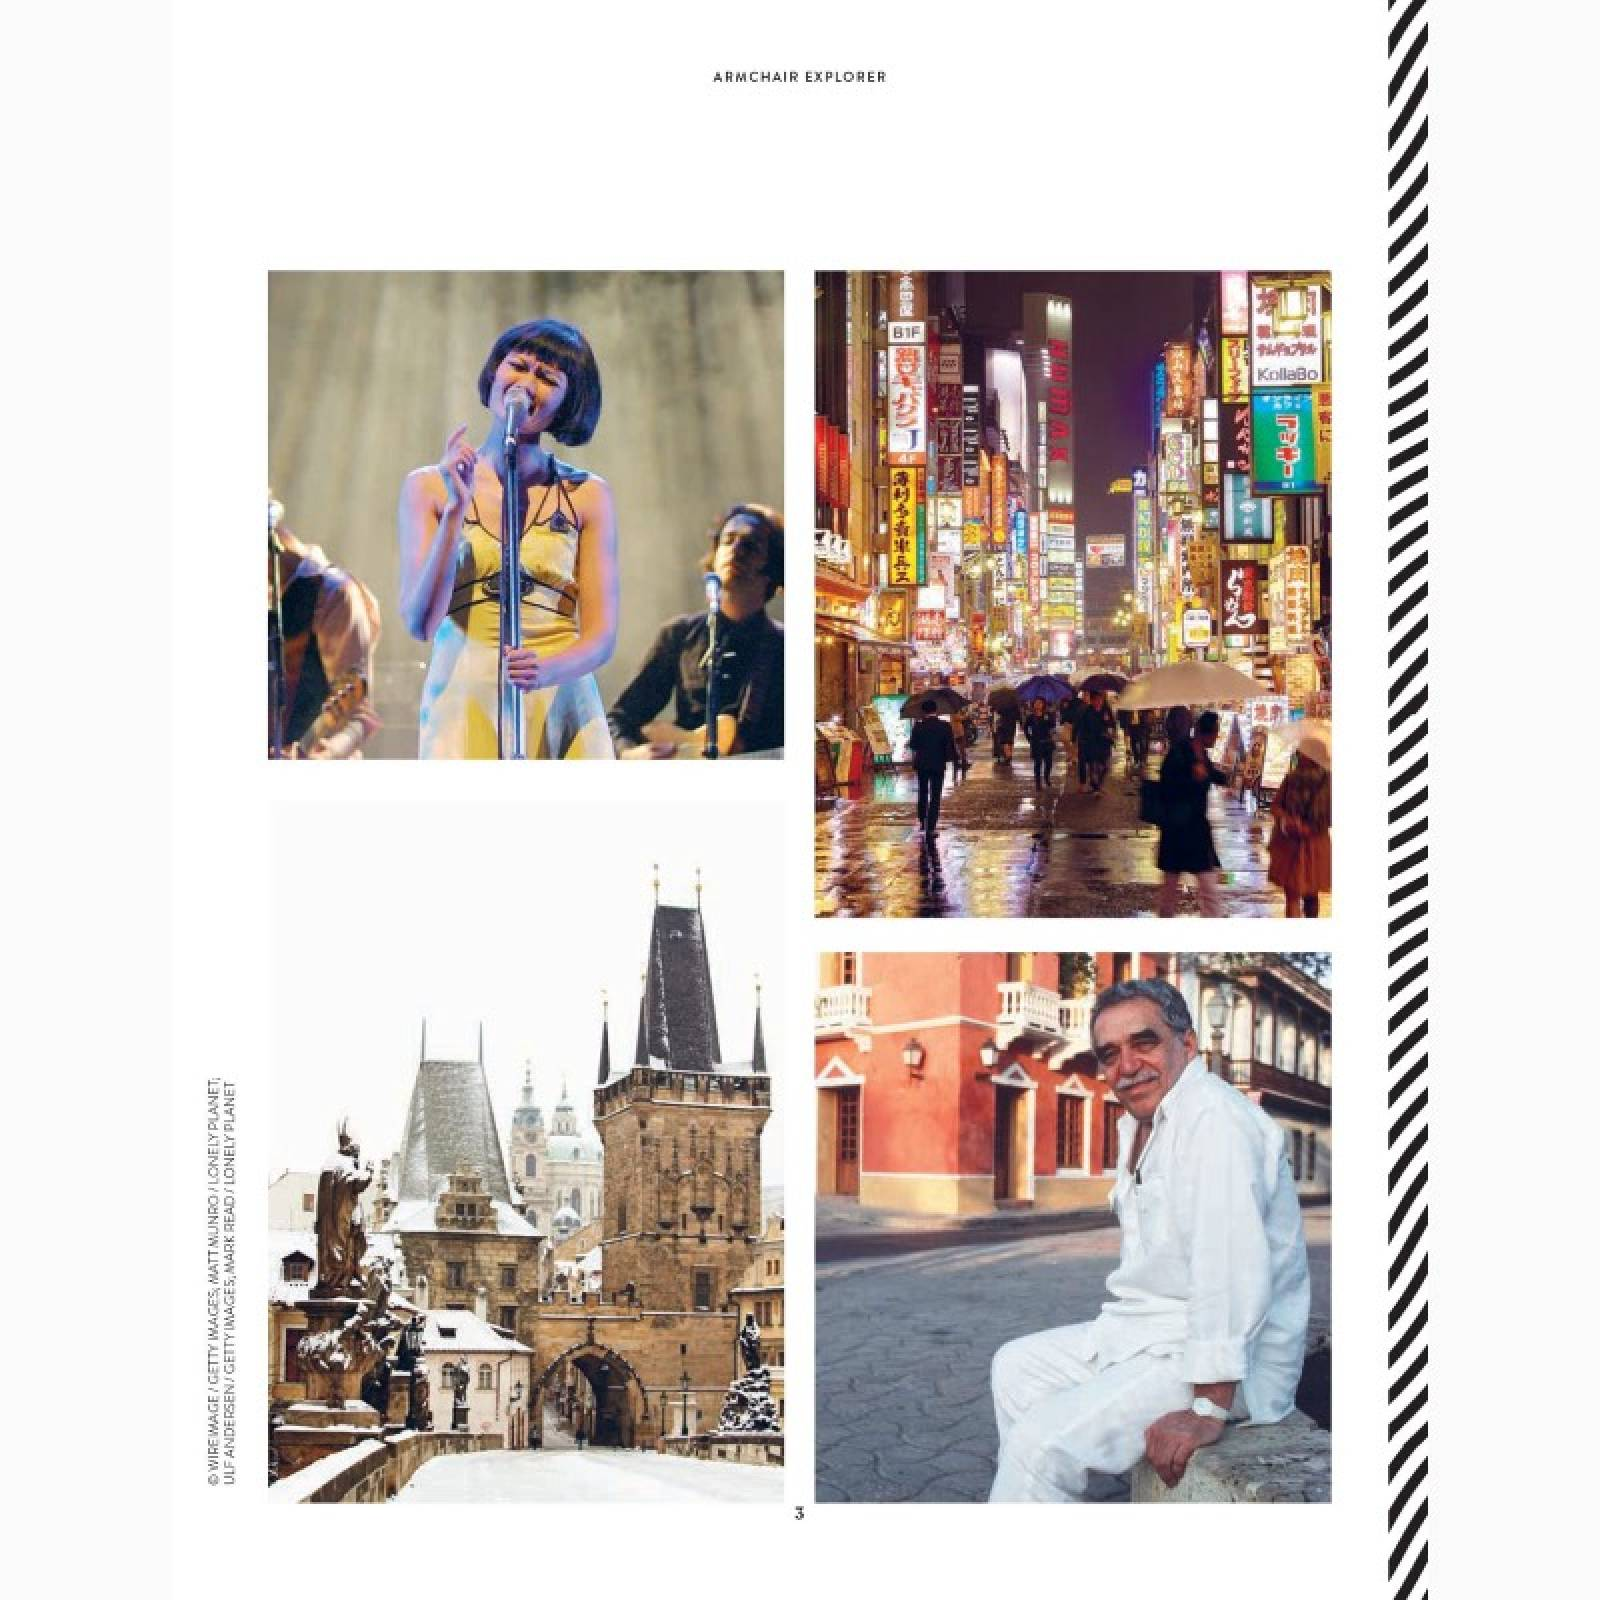 Lonely Planet's Armchair Explorer - Hardback Book thumbnails